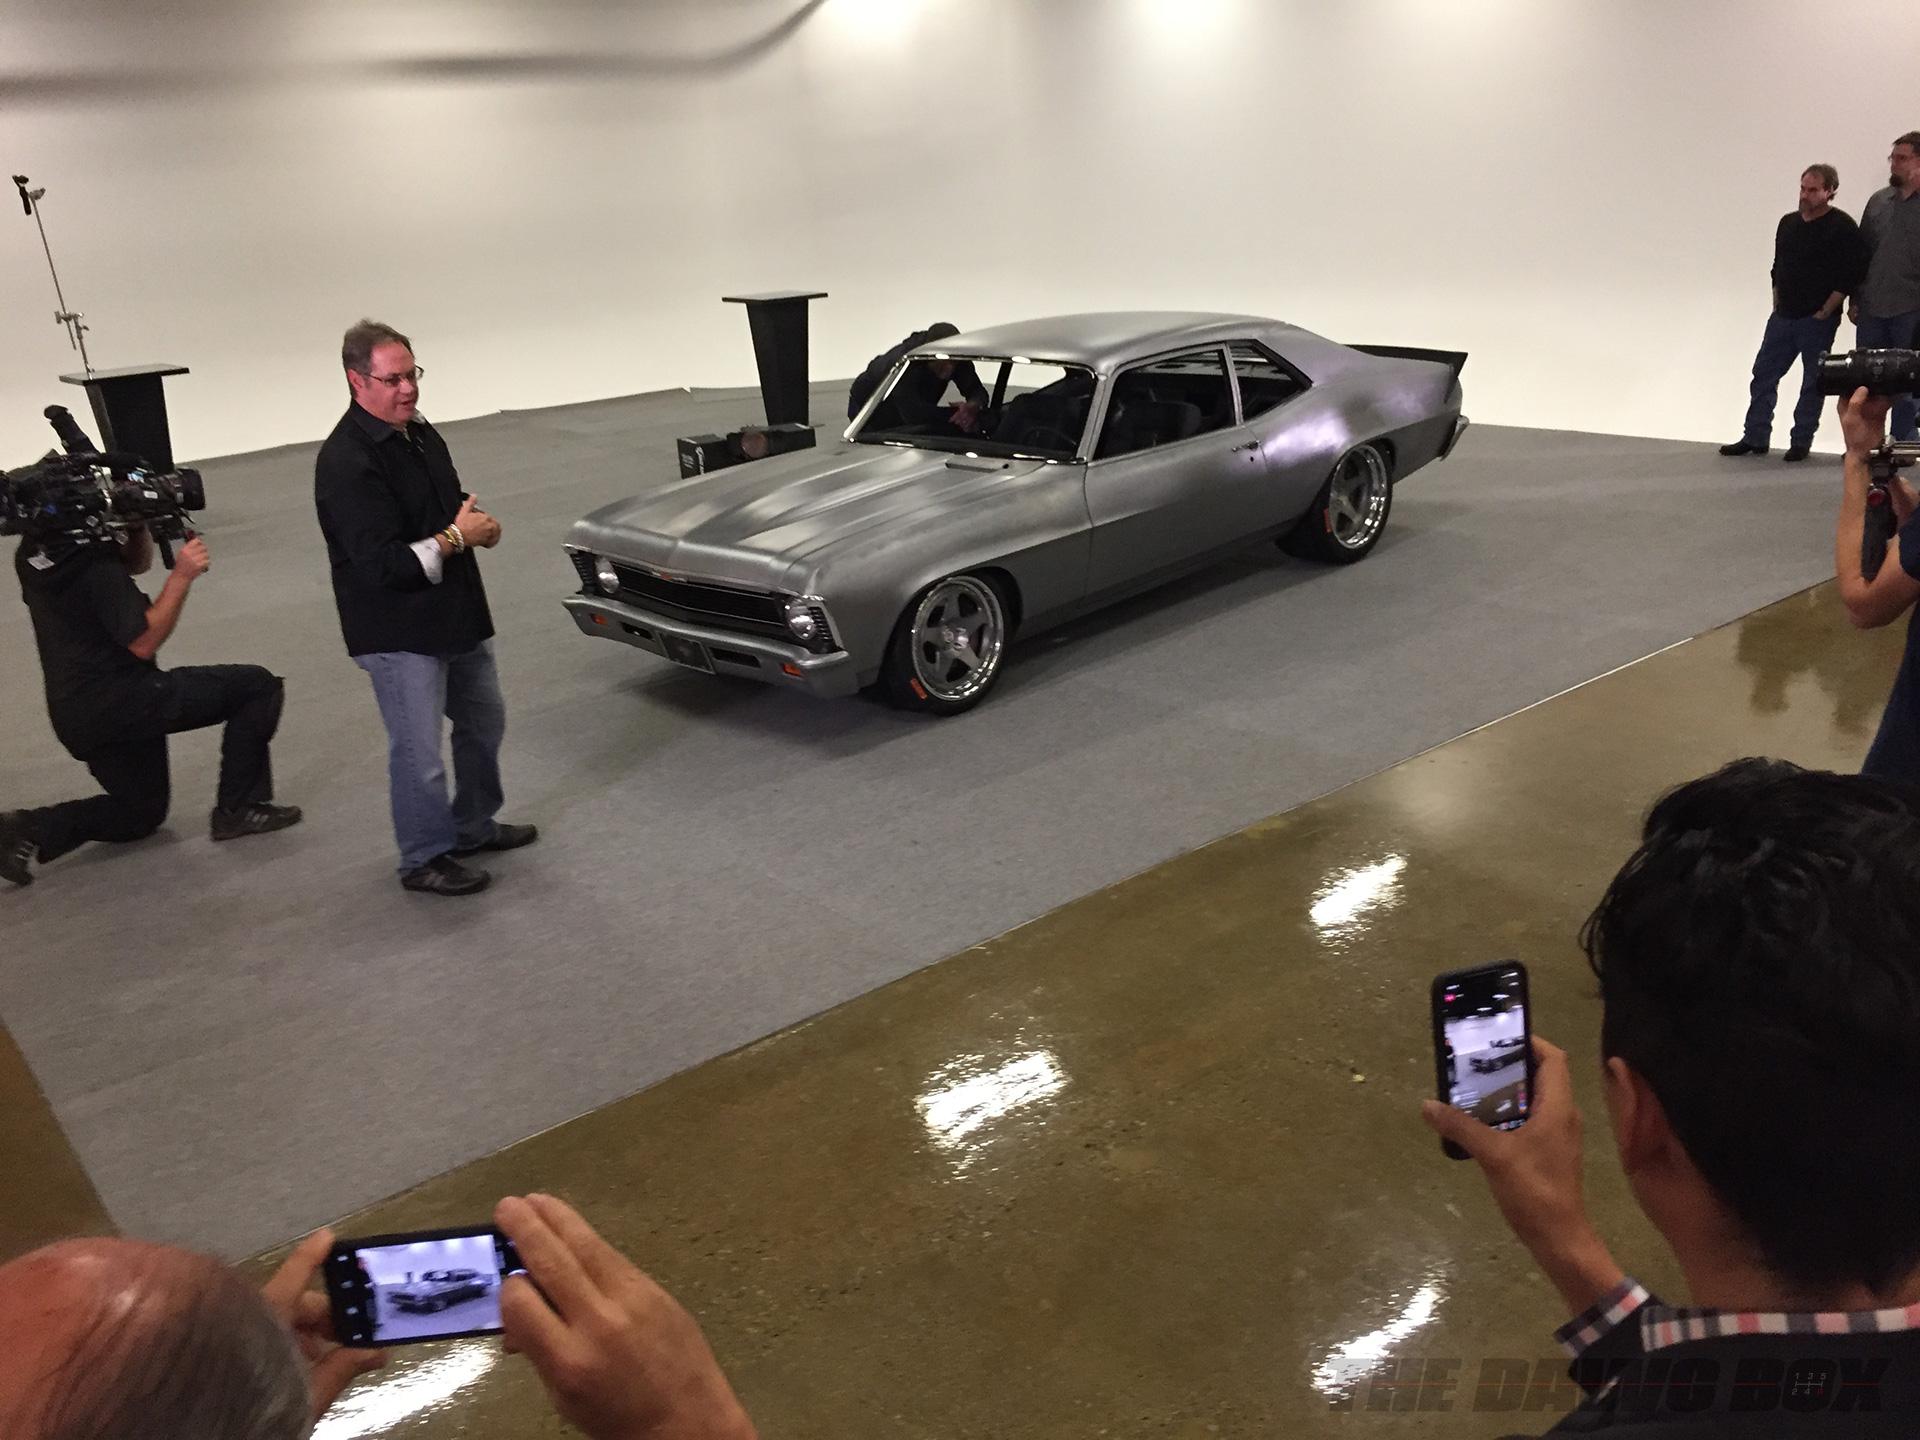 Joe Rogan's Novaro, a combination of the Chevy Nova and Camaro